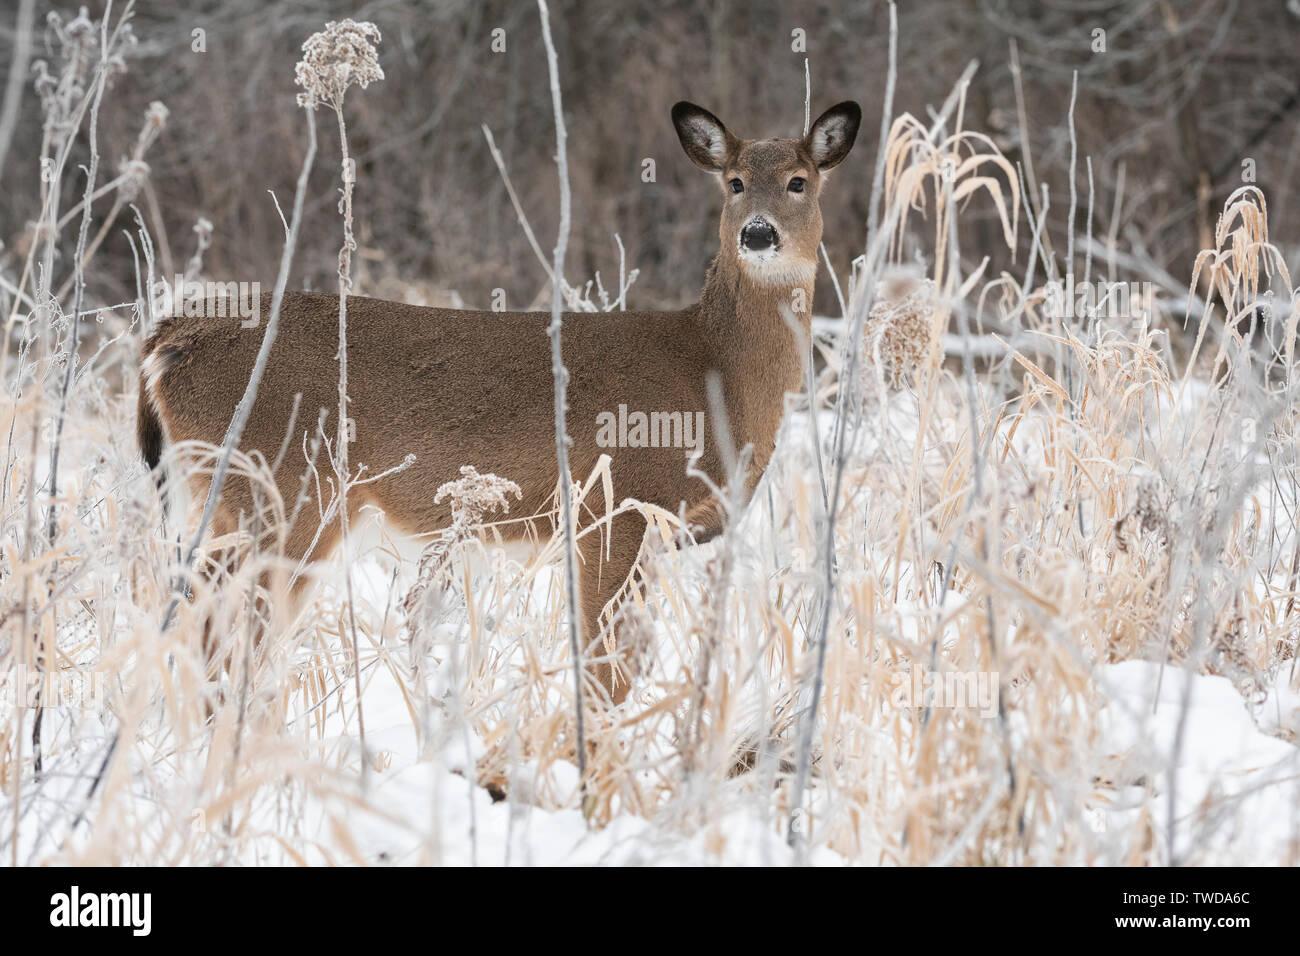 White-tailed deer doe (Odocoileus virginianus), December, E USA, by Dominique Braud/Dembinsky Photo Assoc Stock Photo